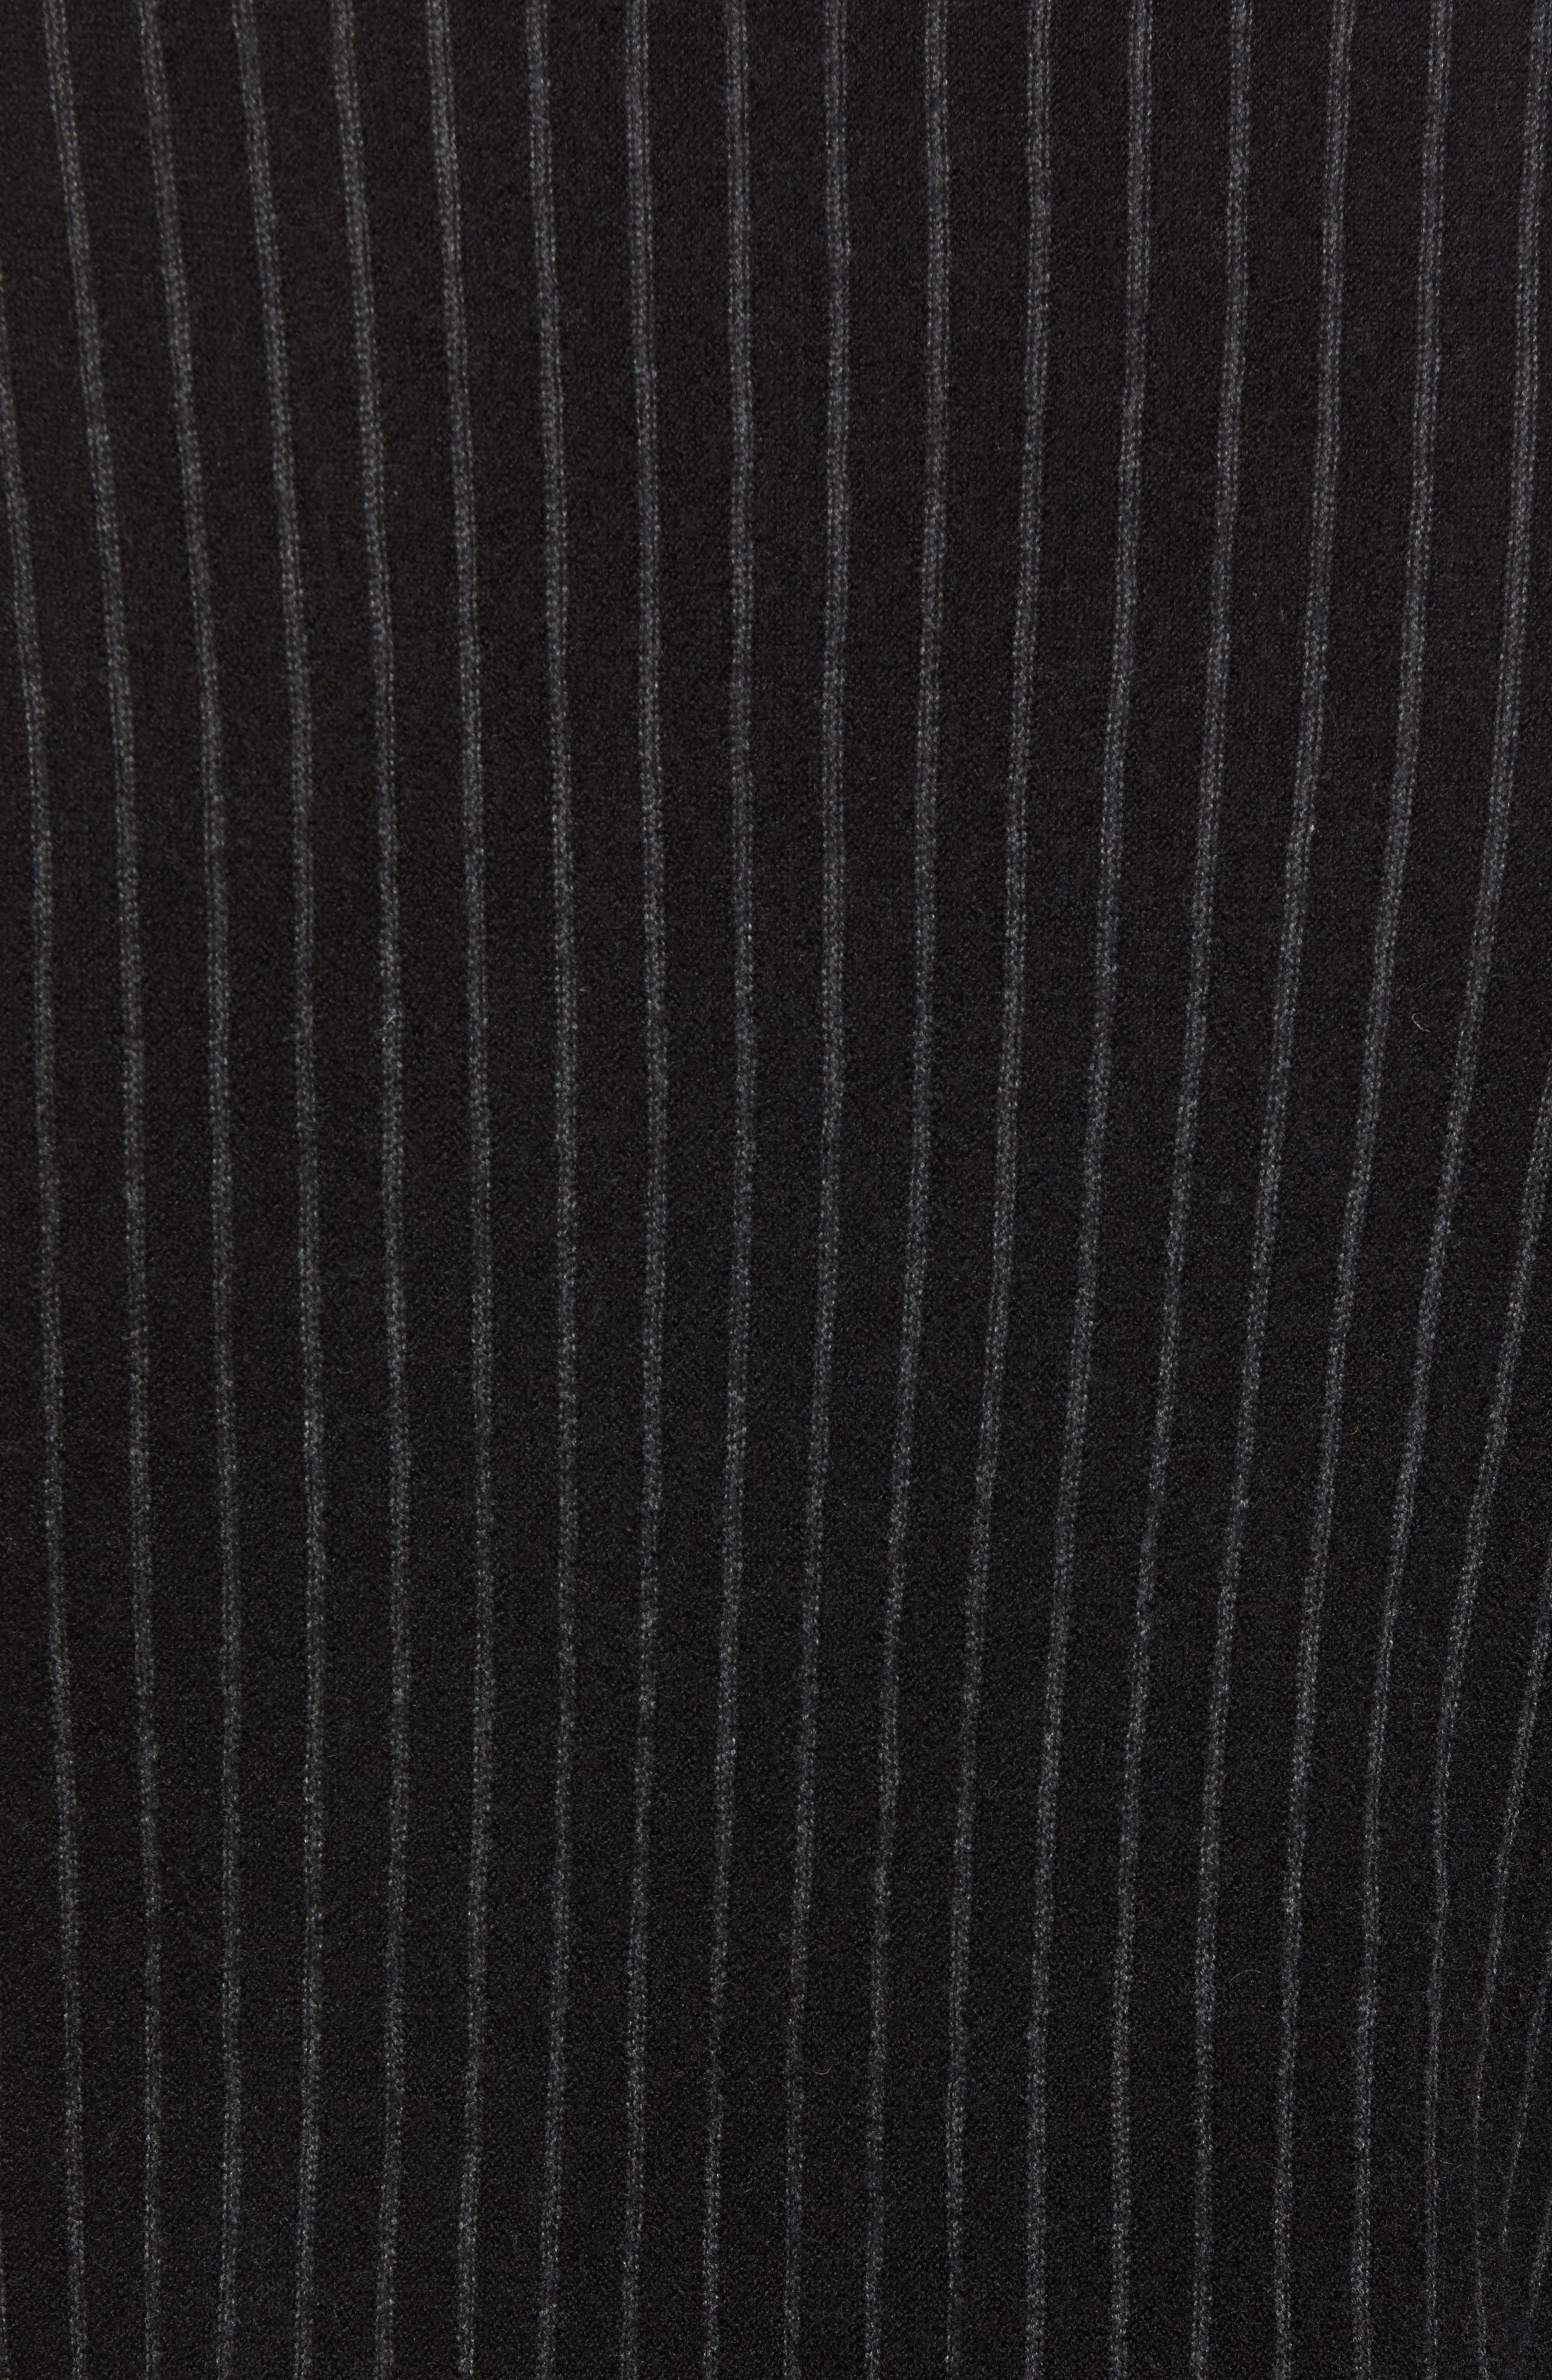 Boiled Wool Blend Crewneck Sweater,                             Alternate thumbnail 5, color,                             MULTI STRIPE